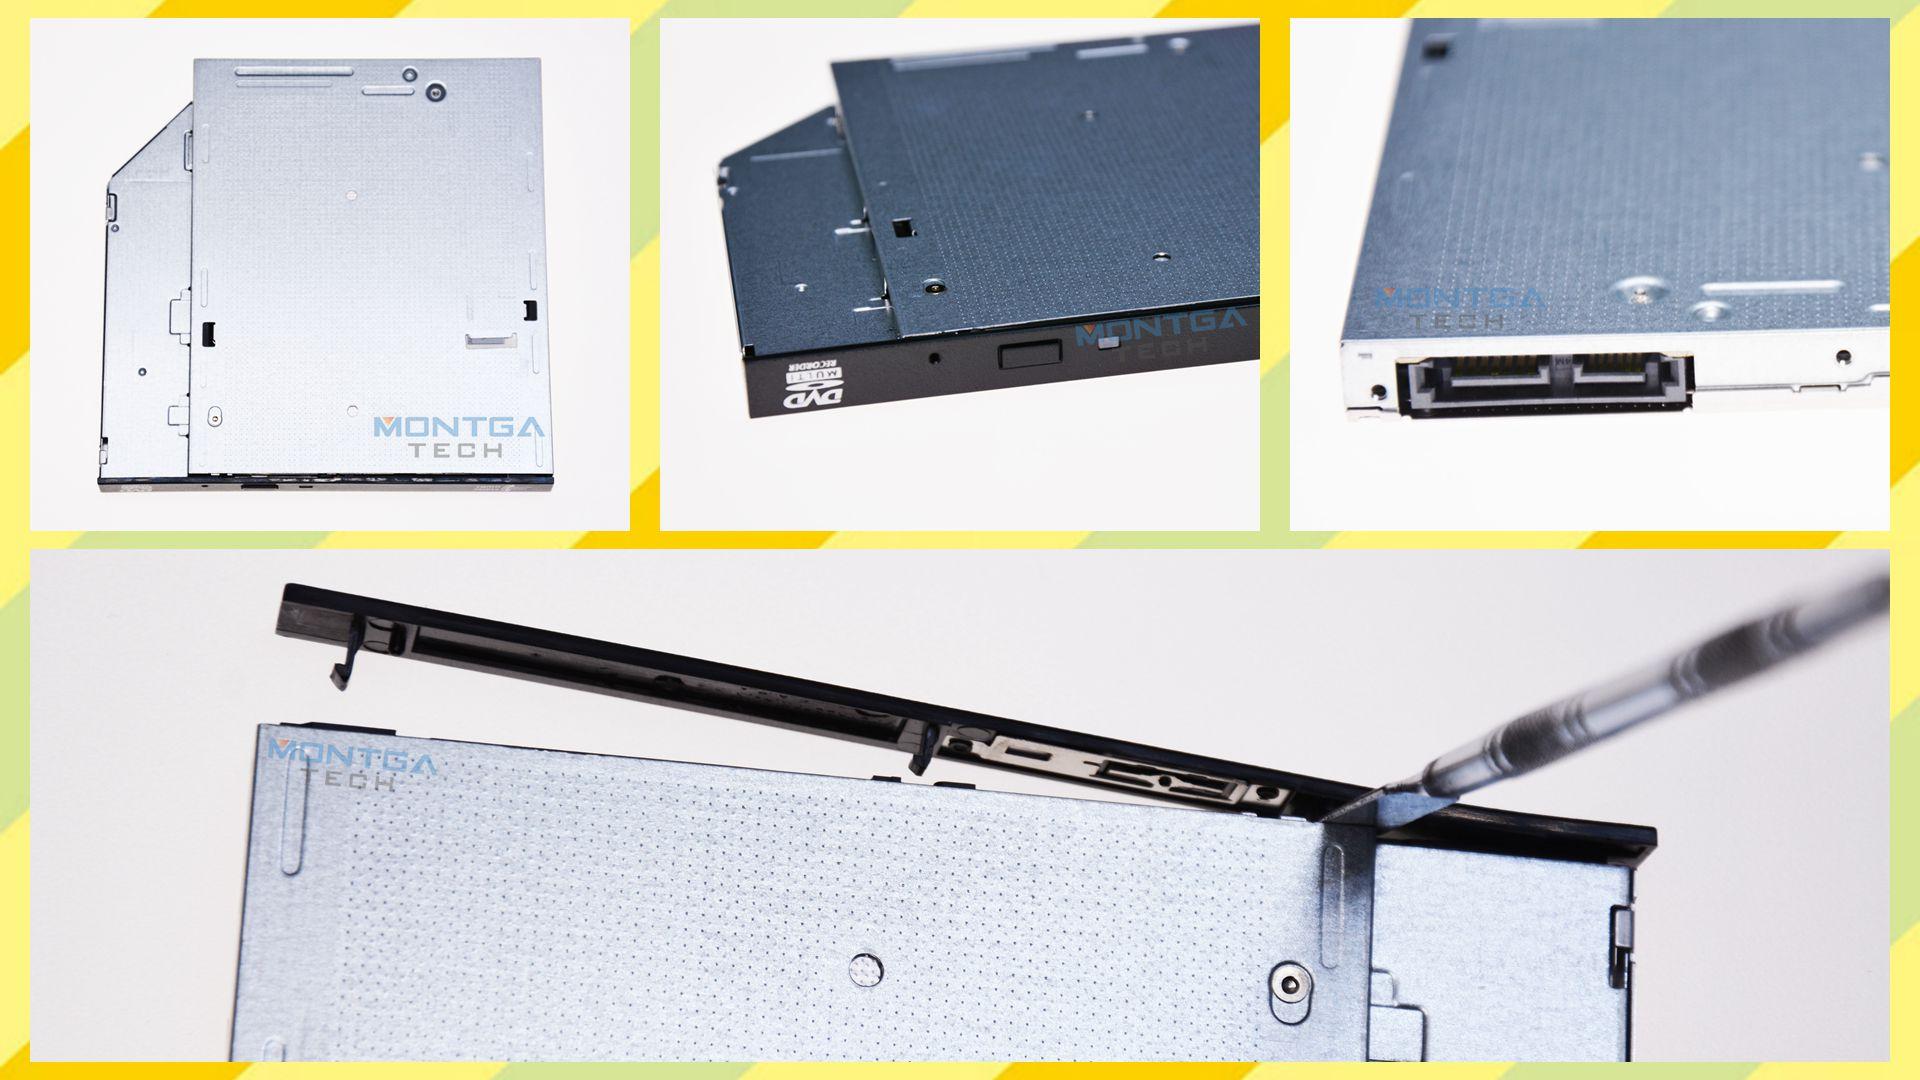 Asus F540S optical reader, Asus F540S optical driver, Asus F540S bruner driver, internal driver Asus F540S, DVD reader Asus F540S,